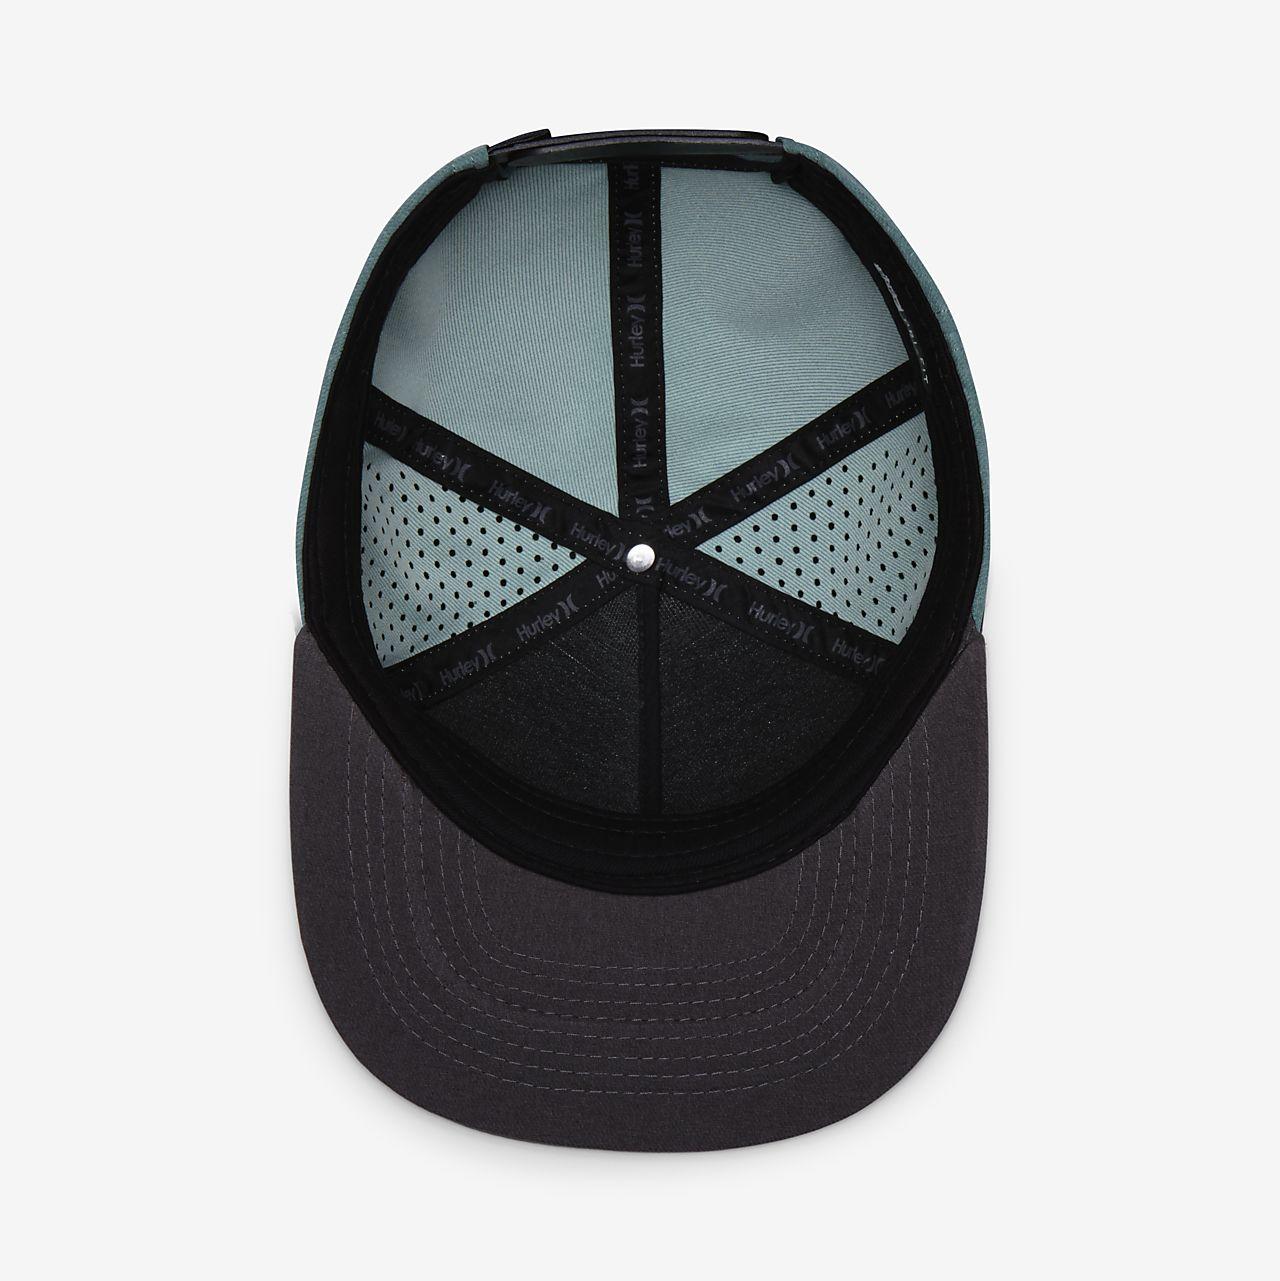 70c9407a7ca0b Gorro ajustable para hombre Hurley Dri-FIT Icon. Nike.com MX